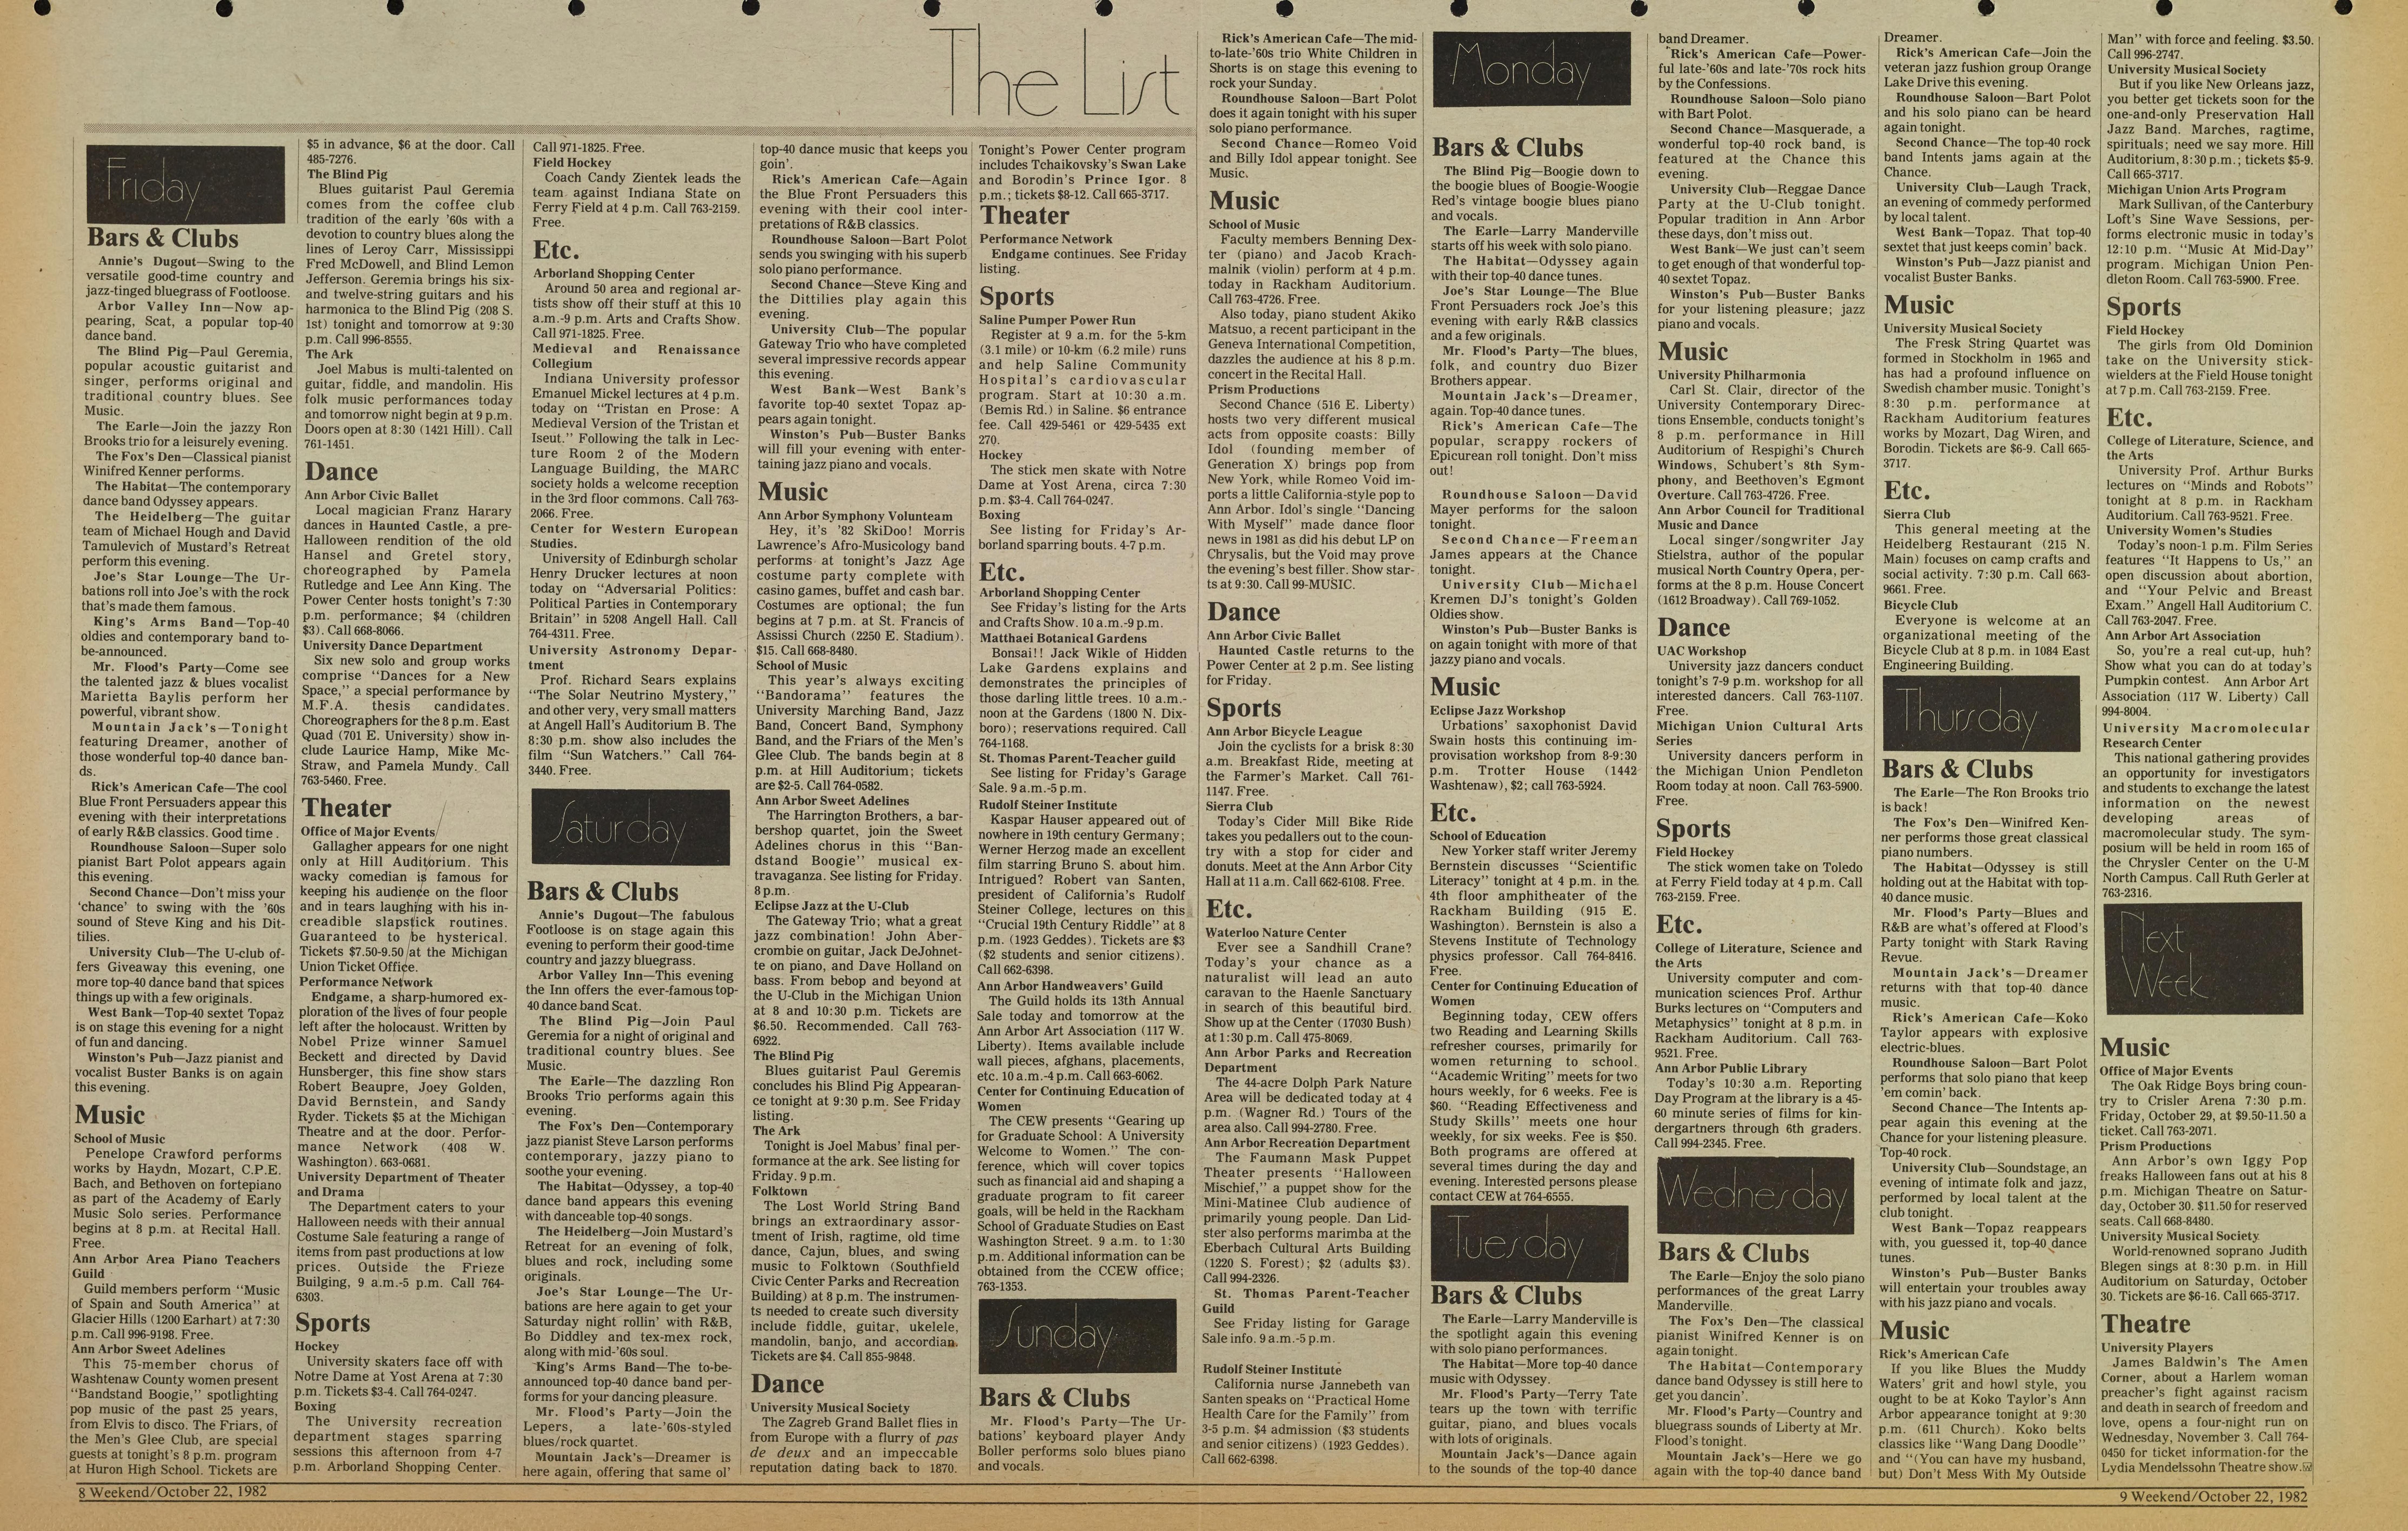 Michigan Daily Digital Archives - October 22, 1982 (vol  93